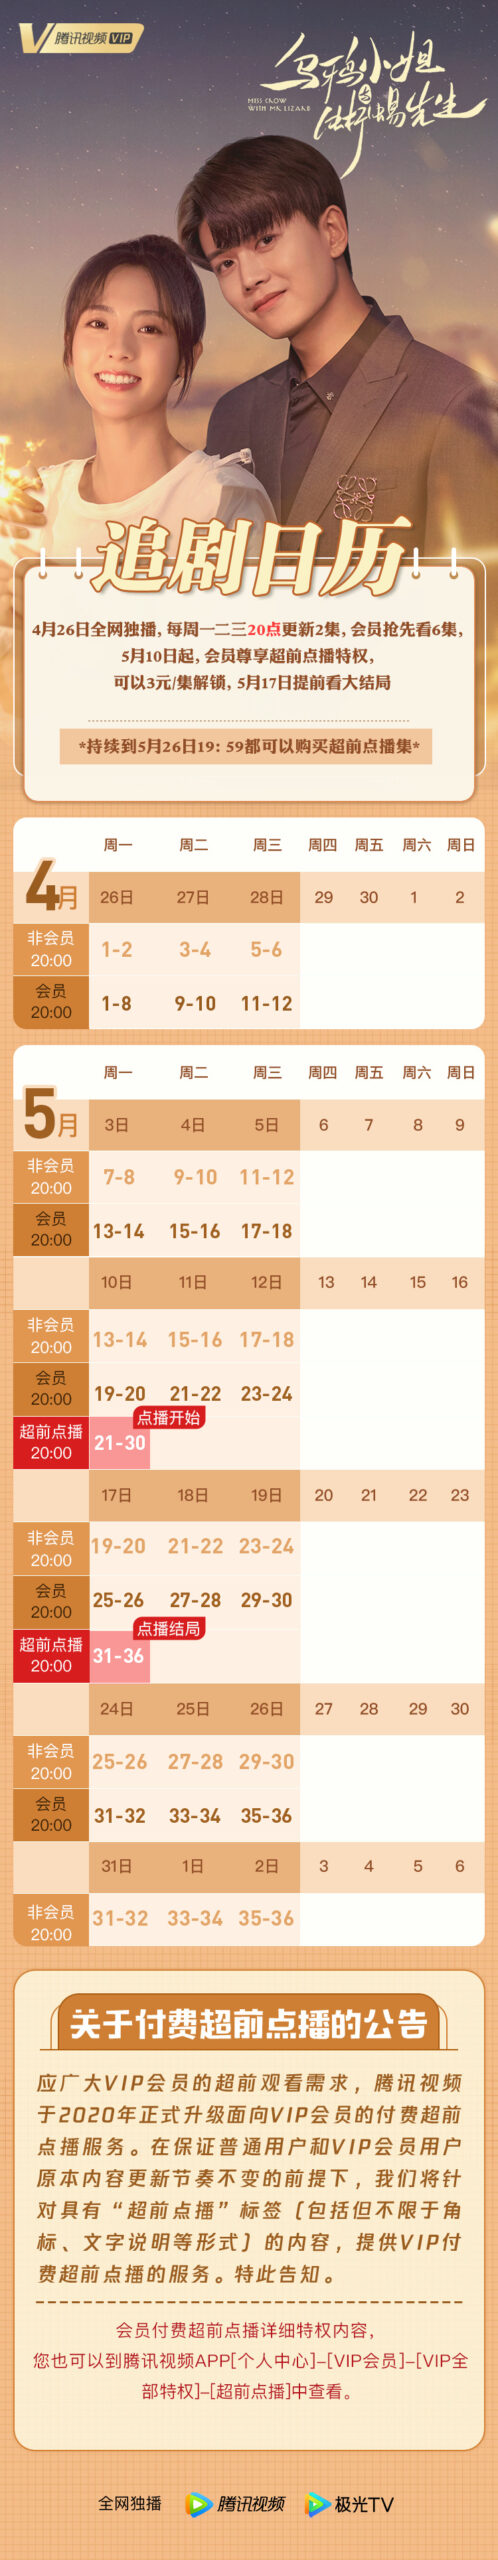 Miss Crow With Mr Lizard Chinese Drama Airing Calendar